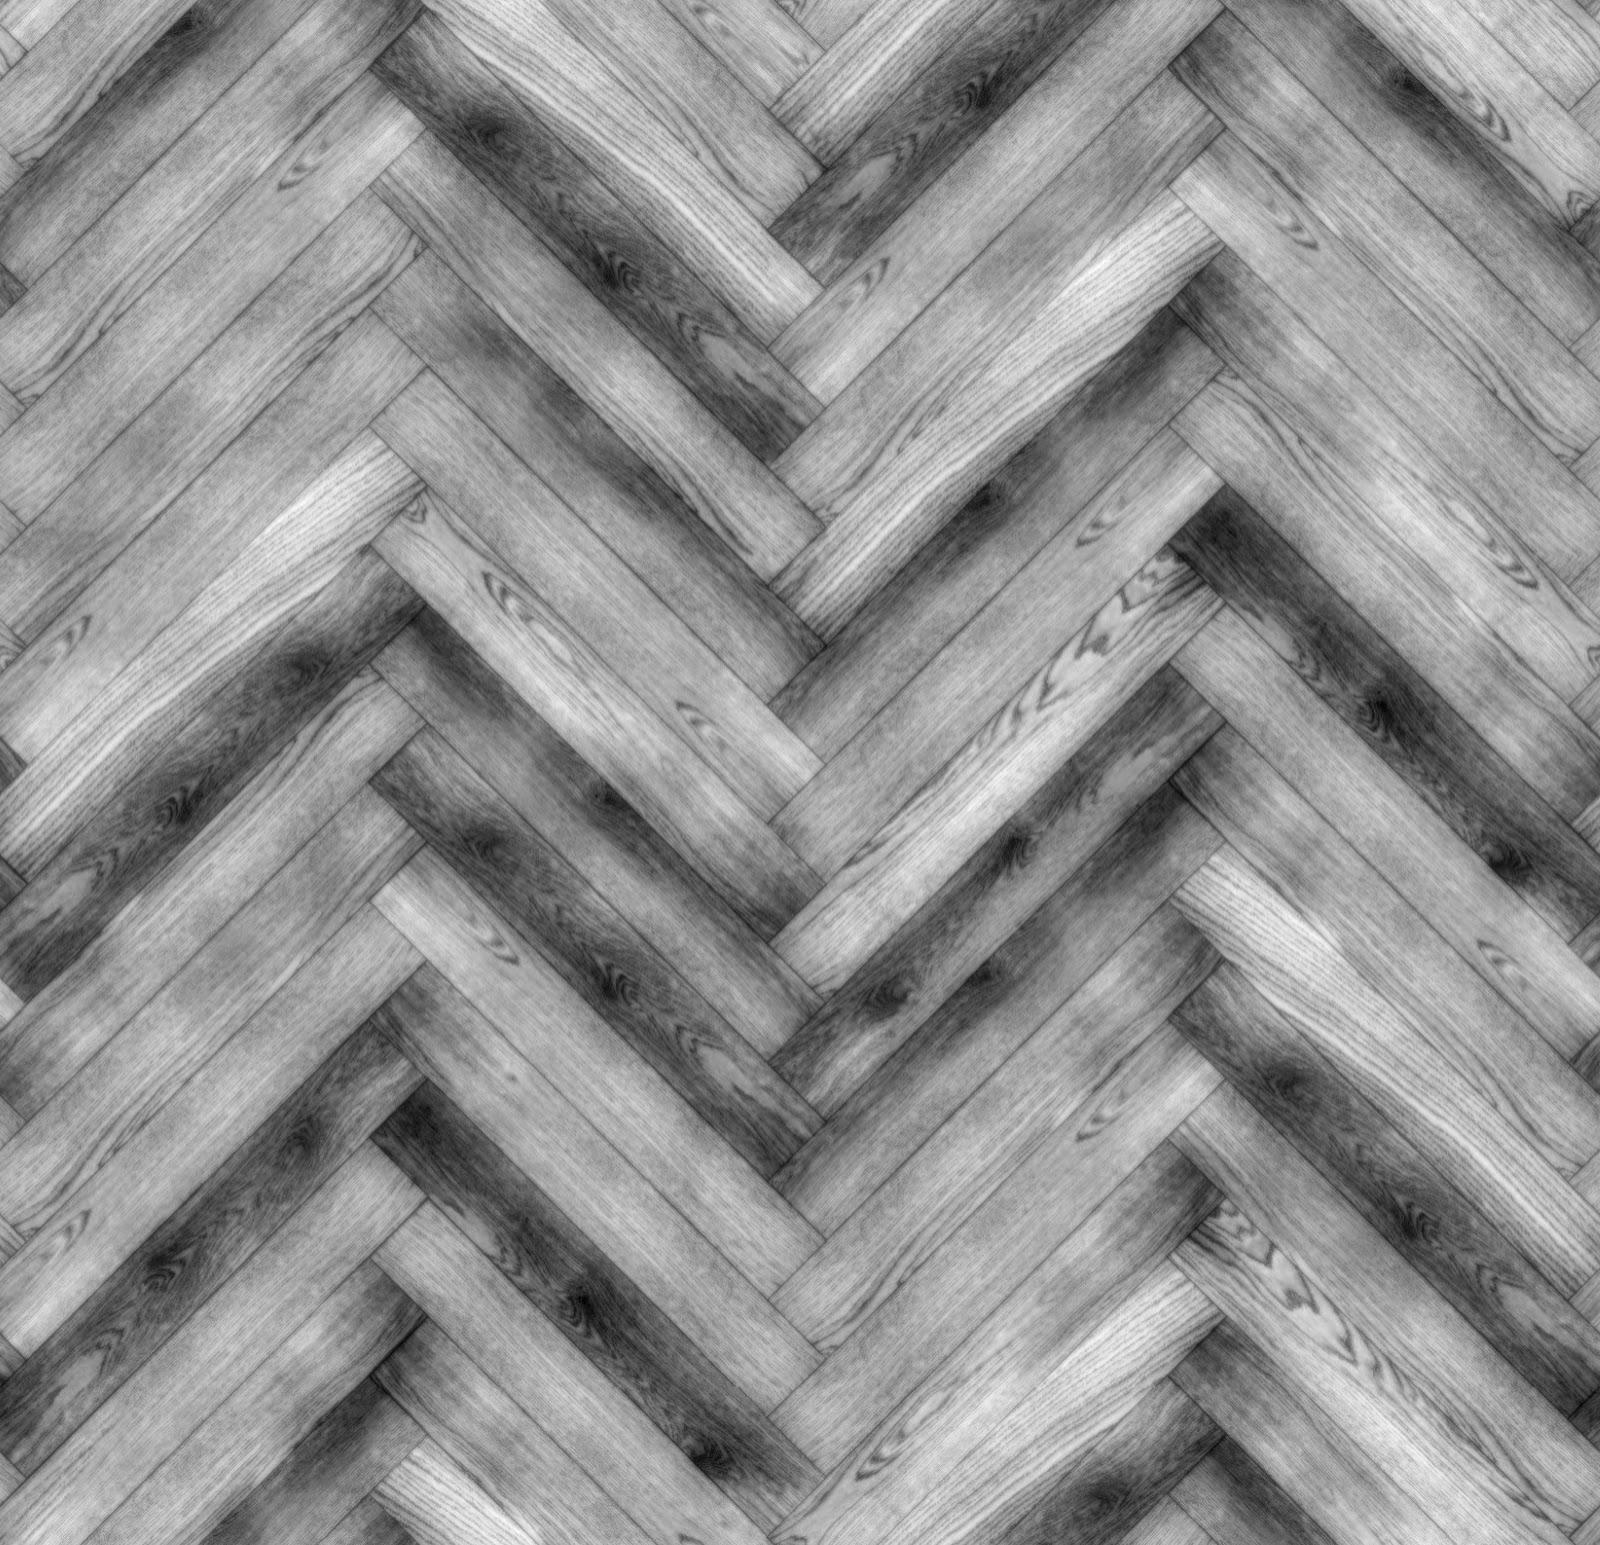 Seamless Wood Parquet Texture Maps Texturise Free